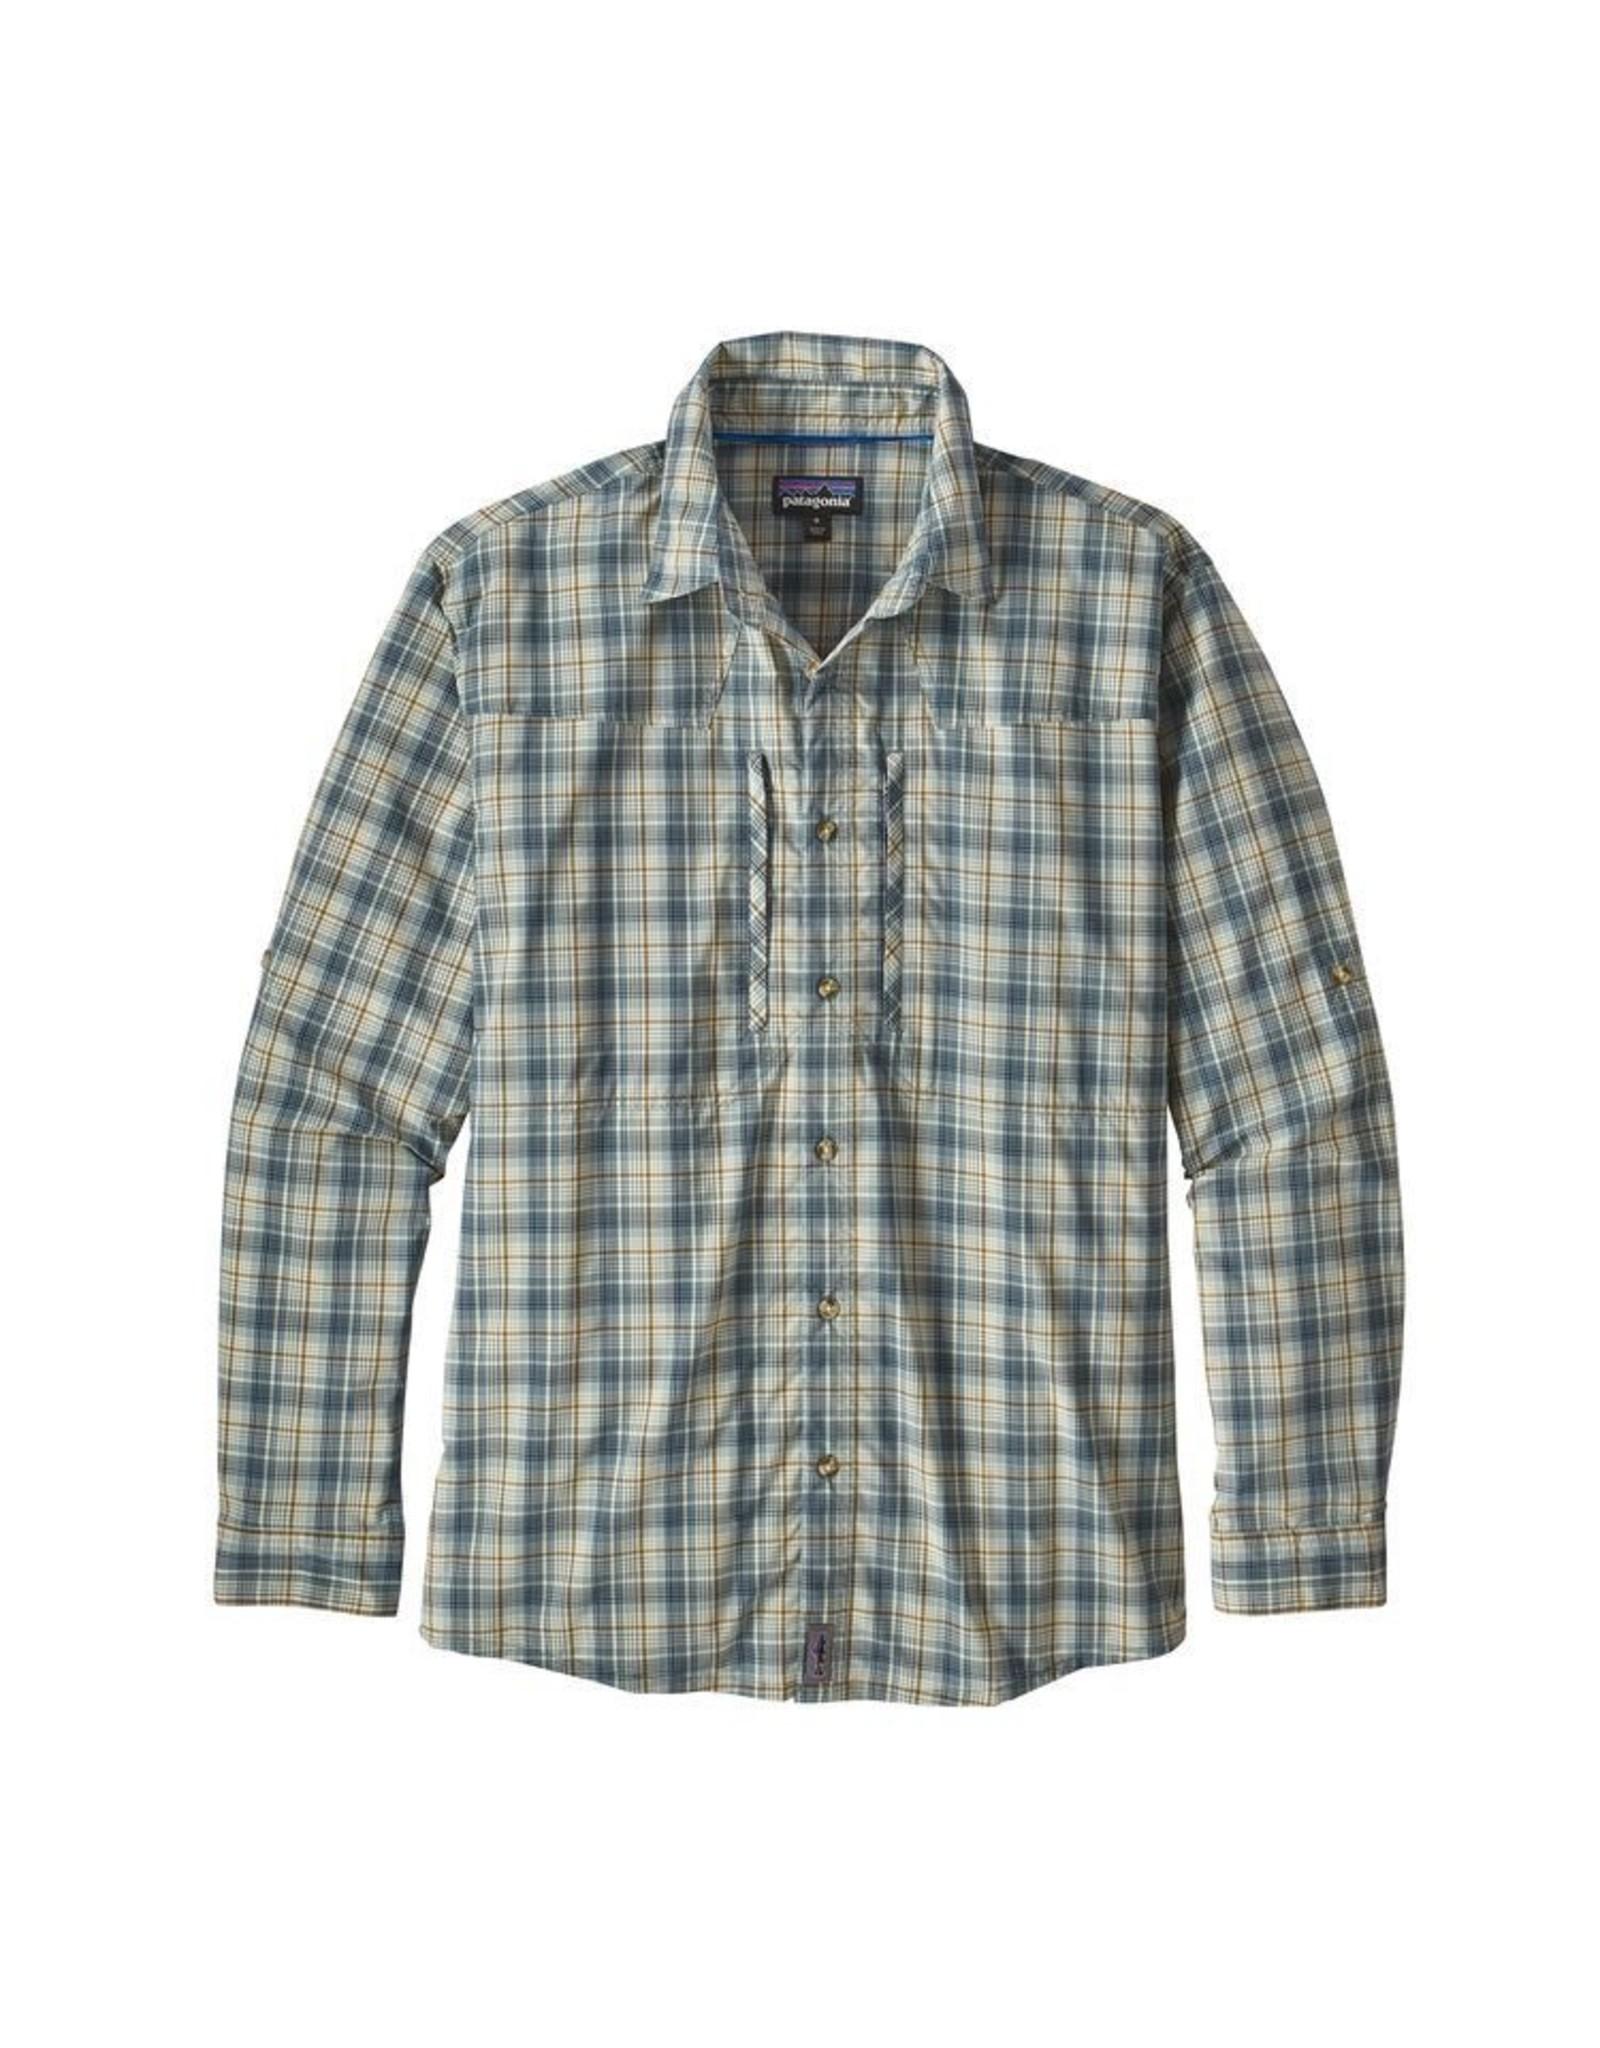 Patagonia Patagonia Long-Sleeved Sun Stretch Shirt